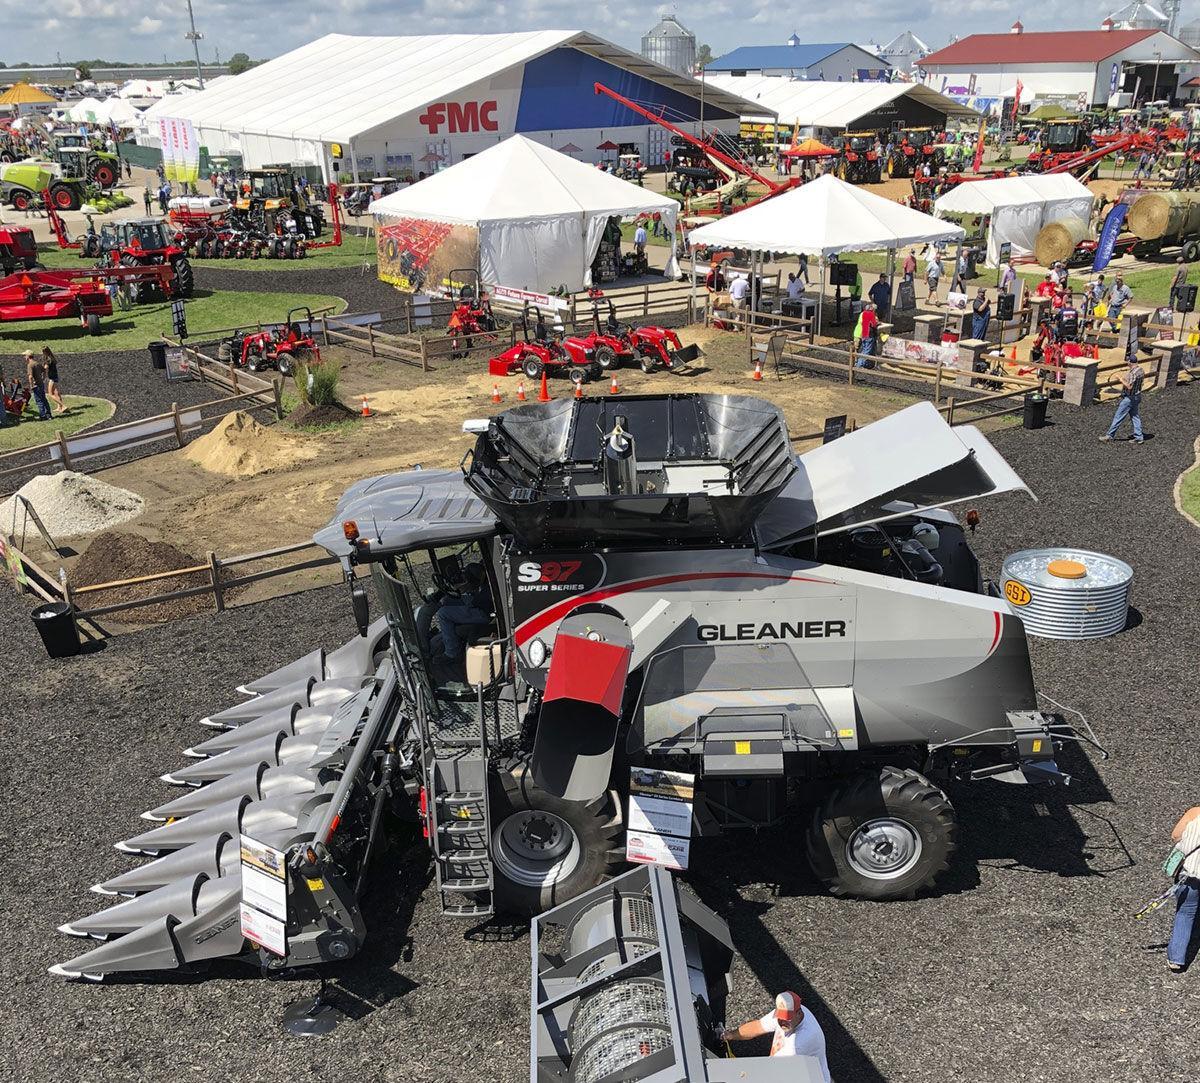 2018 Farm Progress Show overhead view